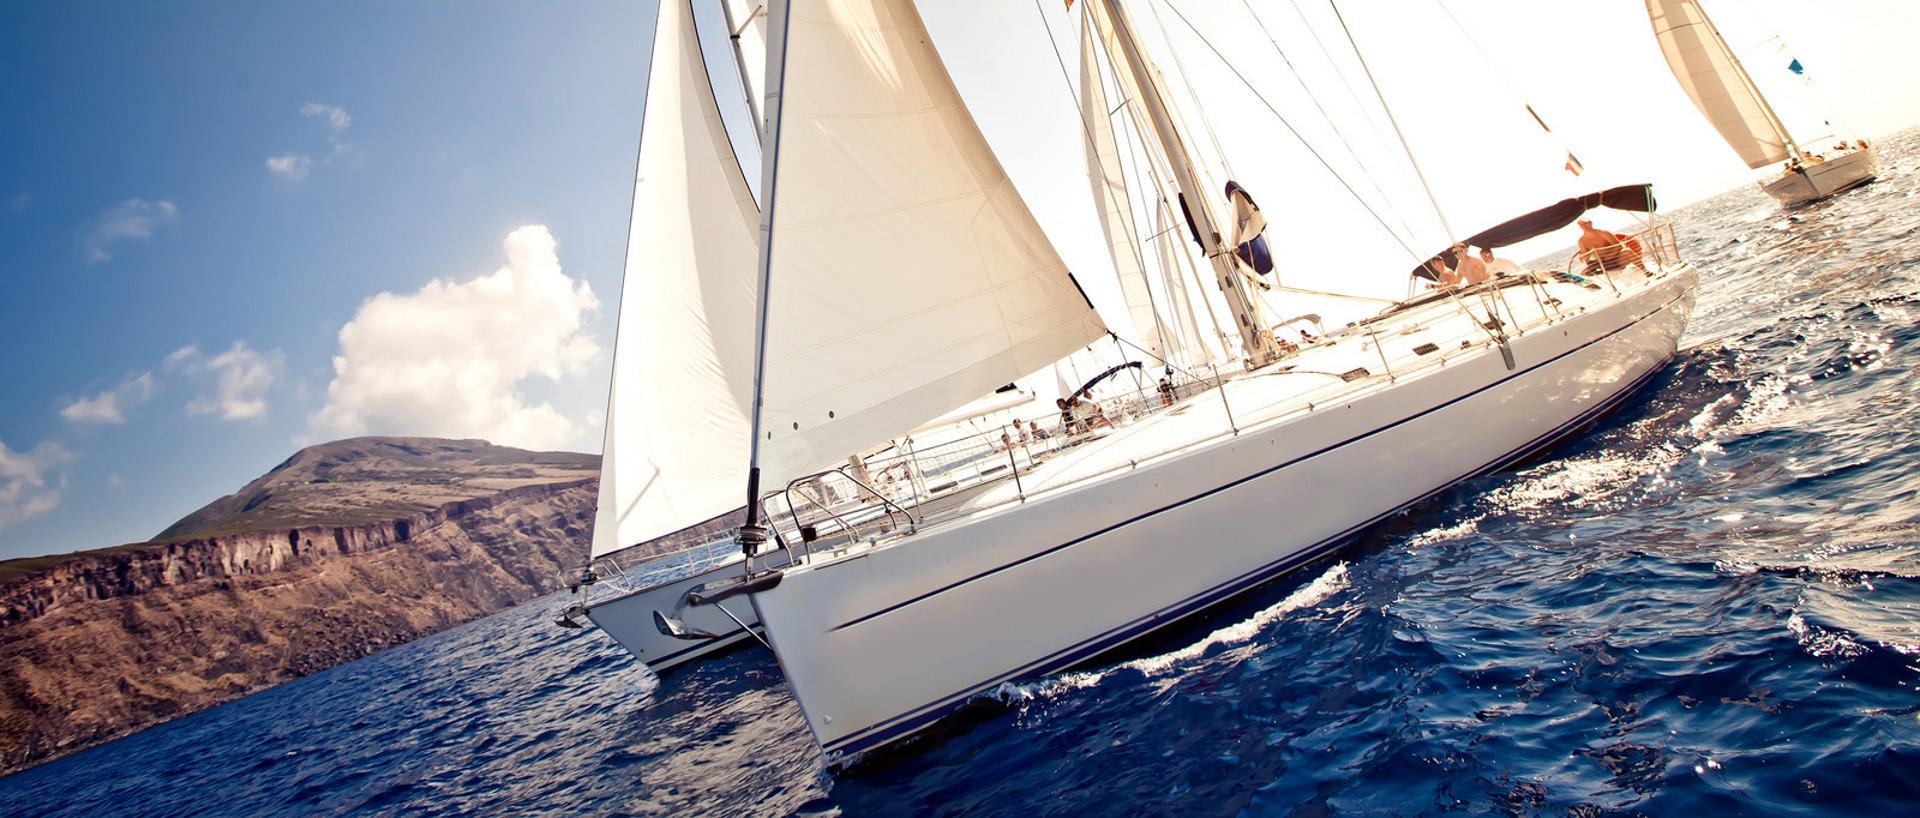 slider_01_sailing_1920